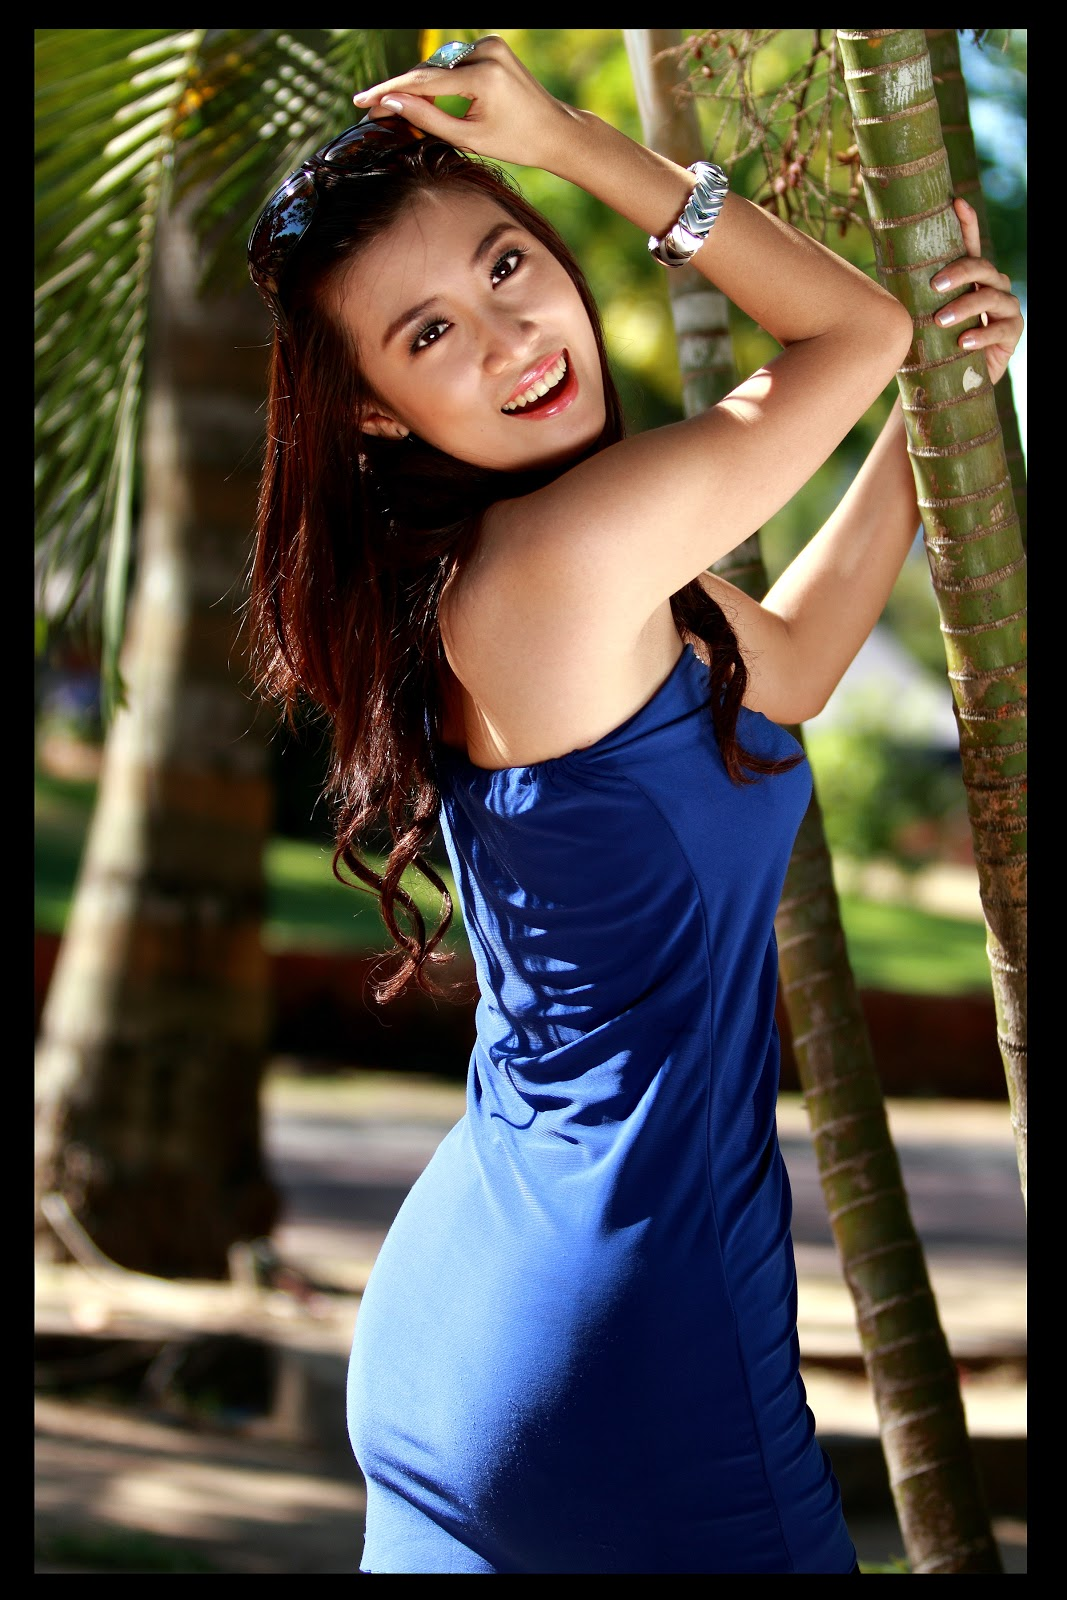 Myanmar Sexy Model Girl Photos Ju Ju Ks Outdoor Fashion-4714